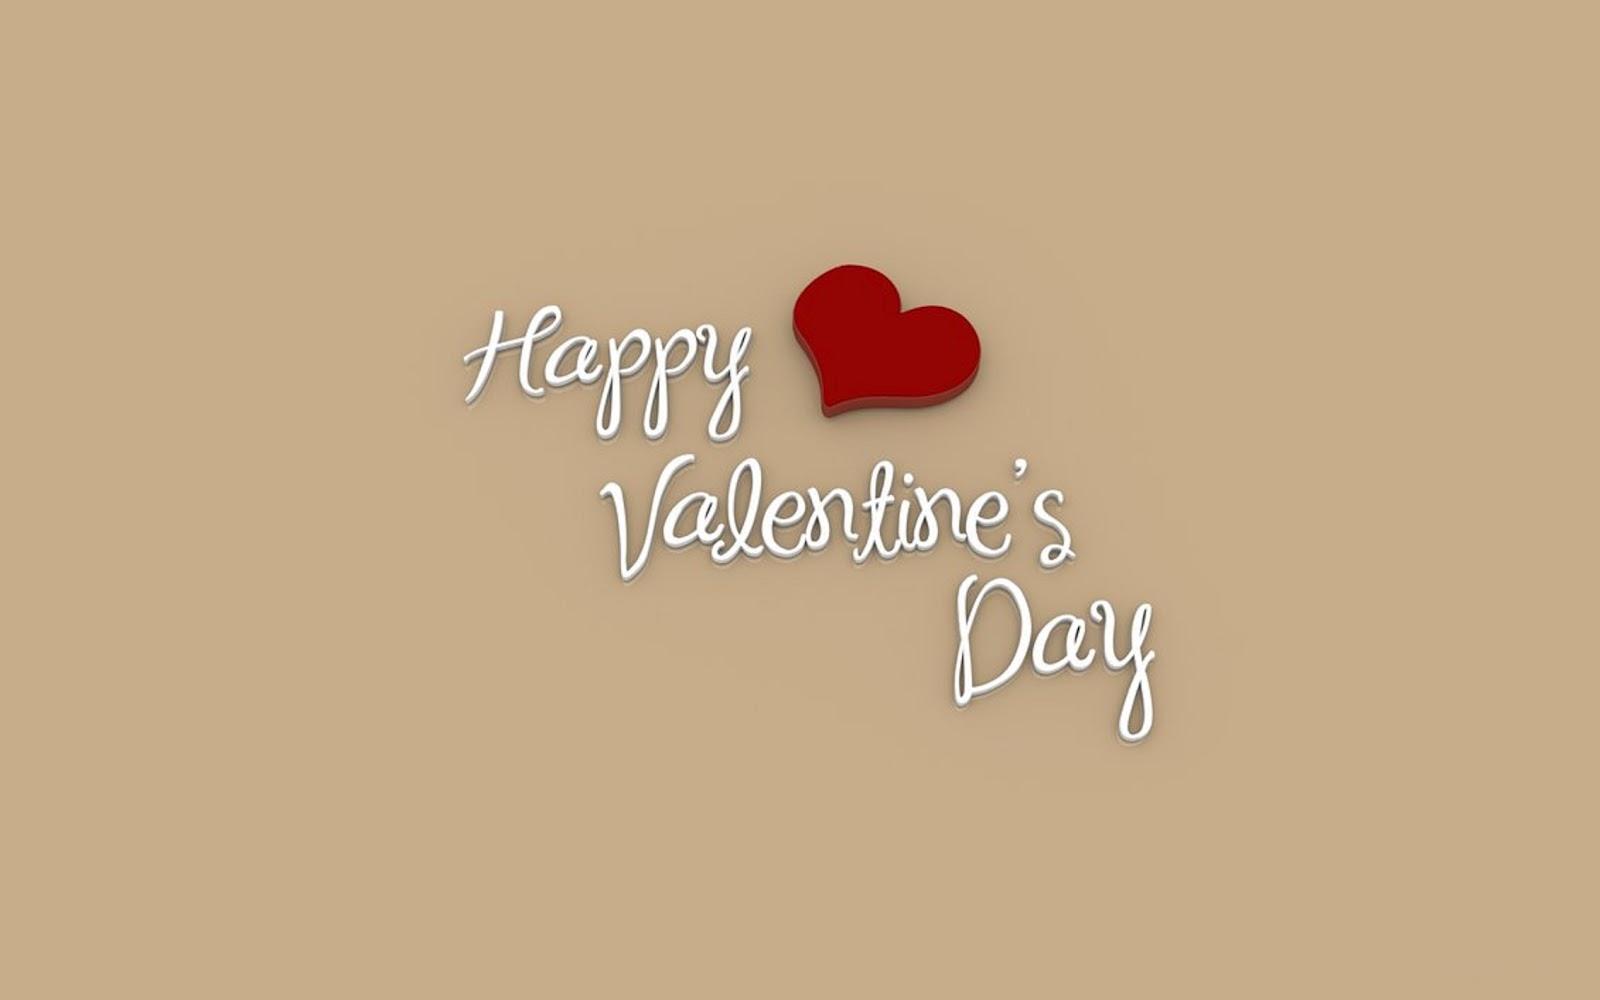 http://3.bp.blogspot.com/-y7zfWsx-ruE/TzQKmpUJDsI/AAAAAAAAHIM/MPTuo-QA4NU/s1600/Happy%20Valentine%20Day%20sayings.jpg